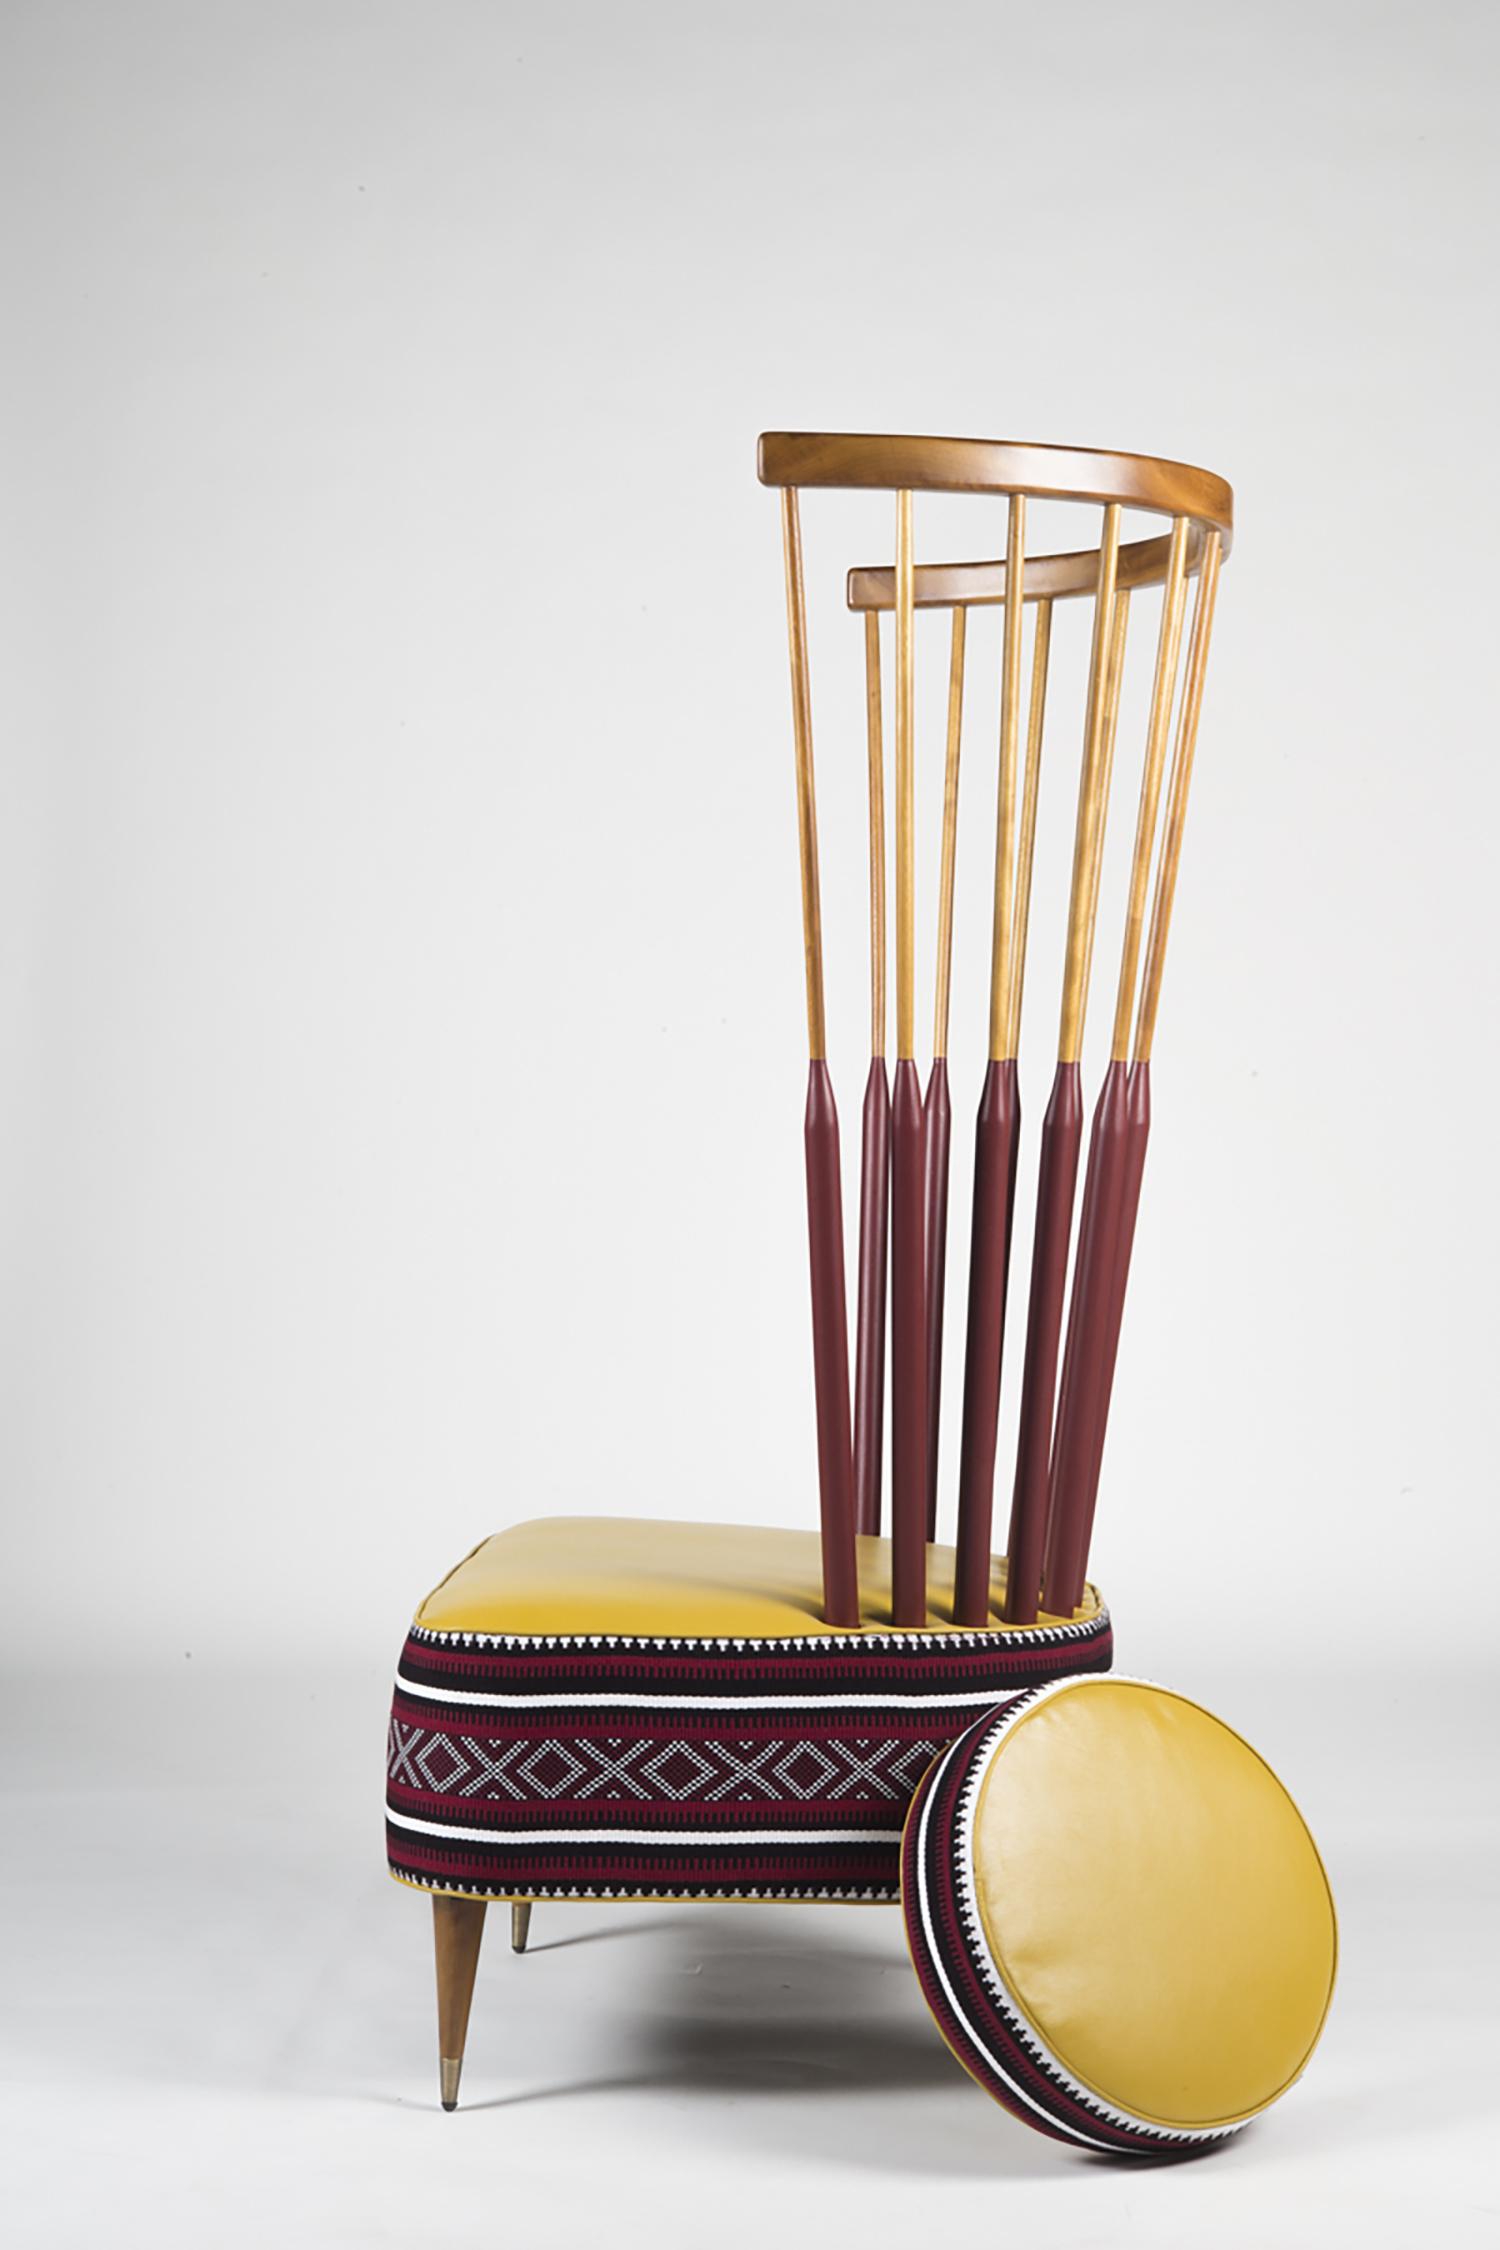 Studio MUJU -Moza Chair 4.jpg